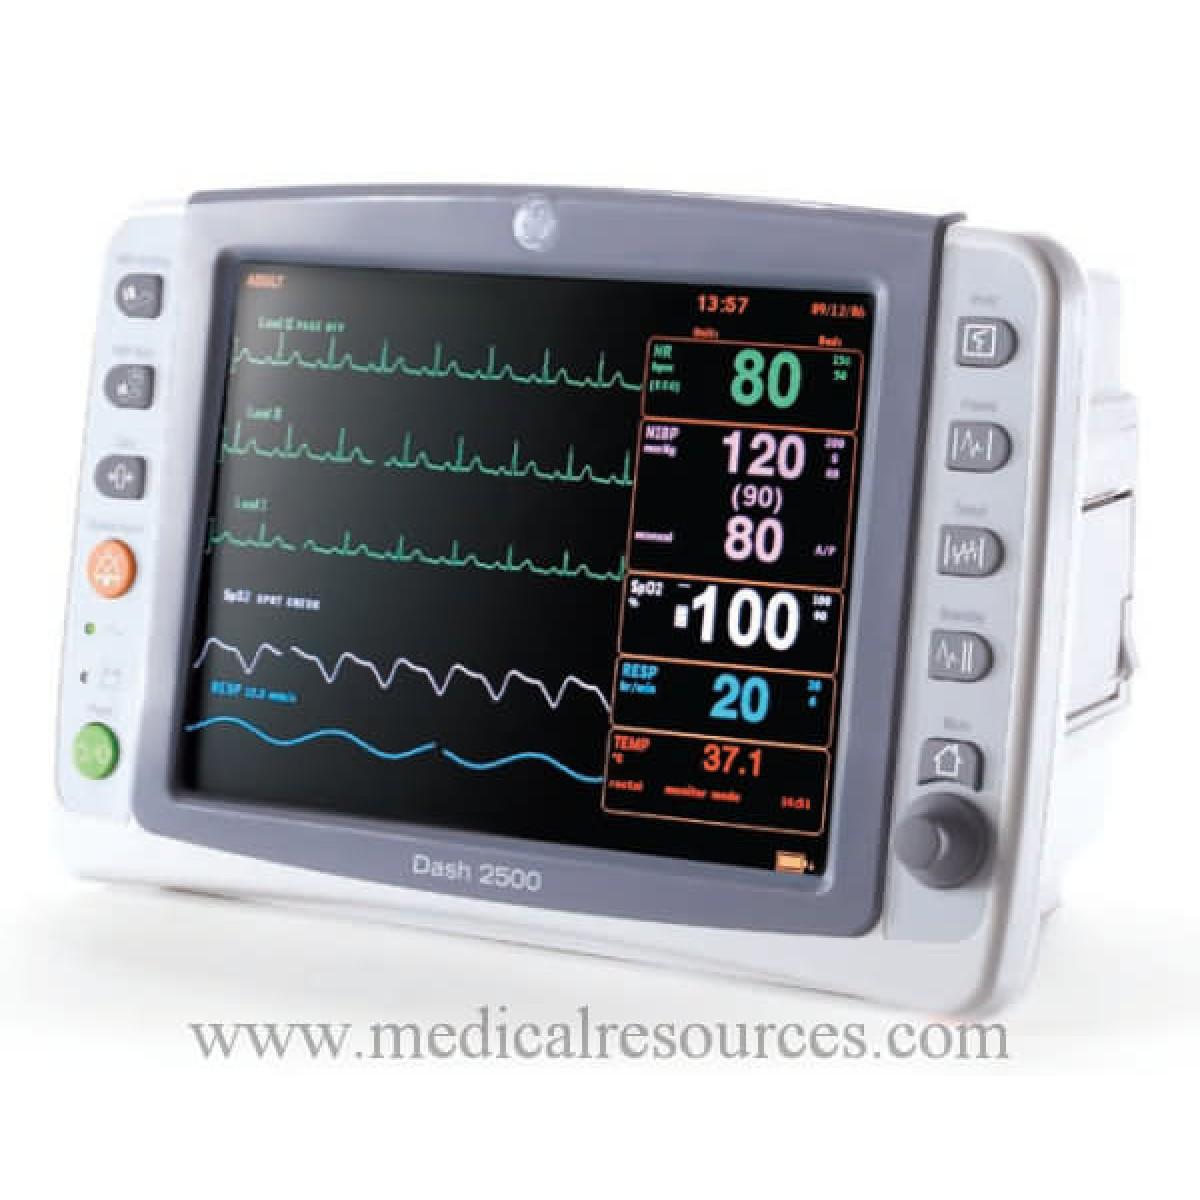 Ge Healthcare Dash 2500 Patient Monitors Sale